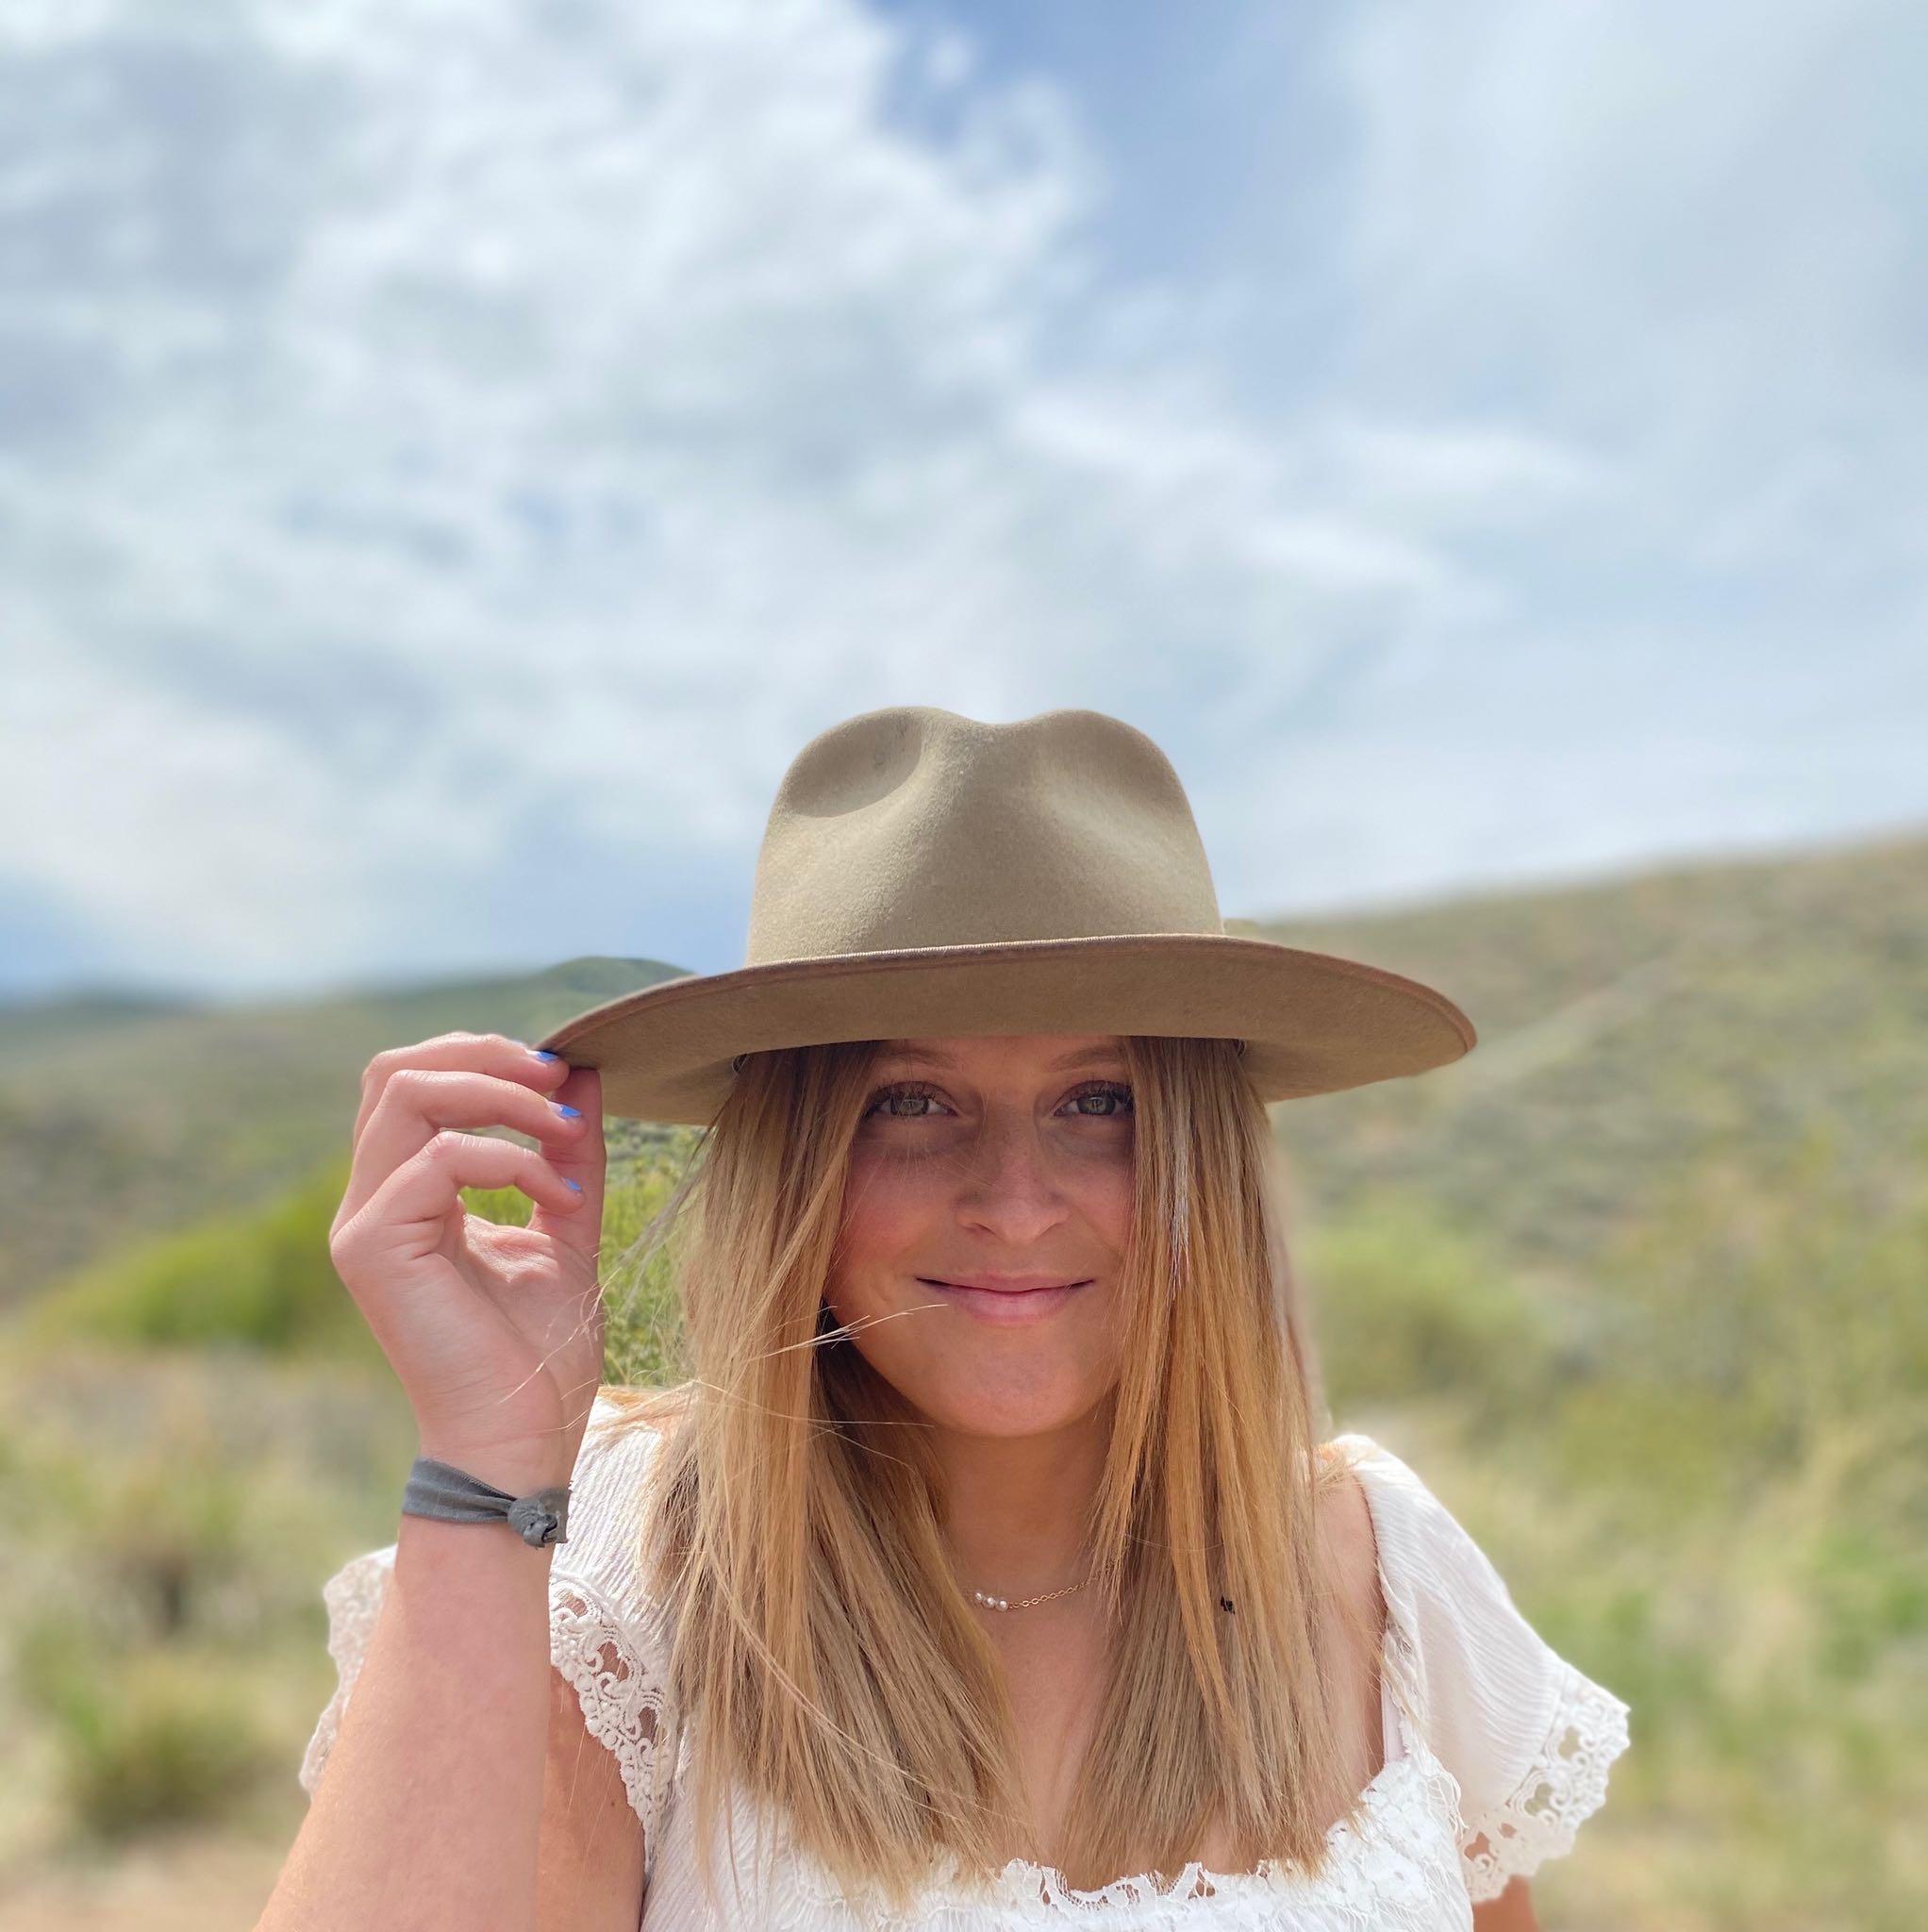 Samantha Brunker